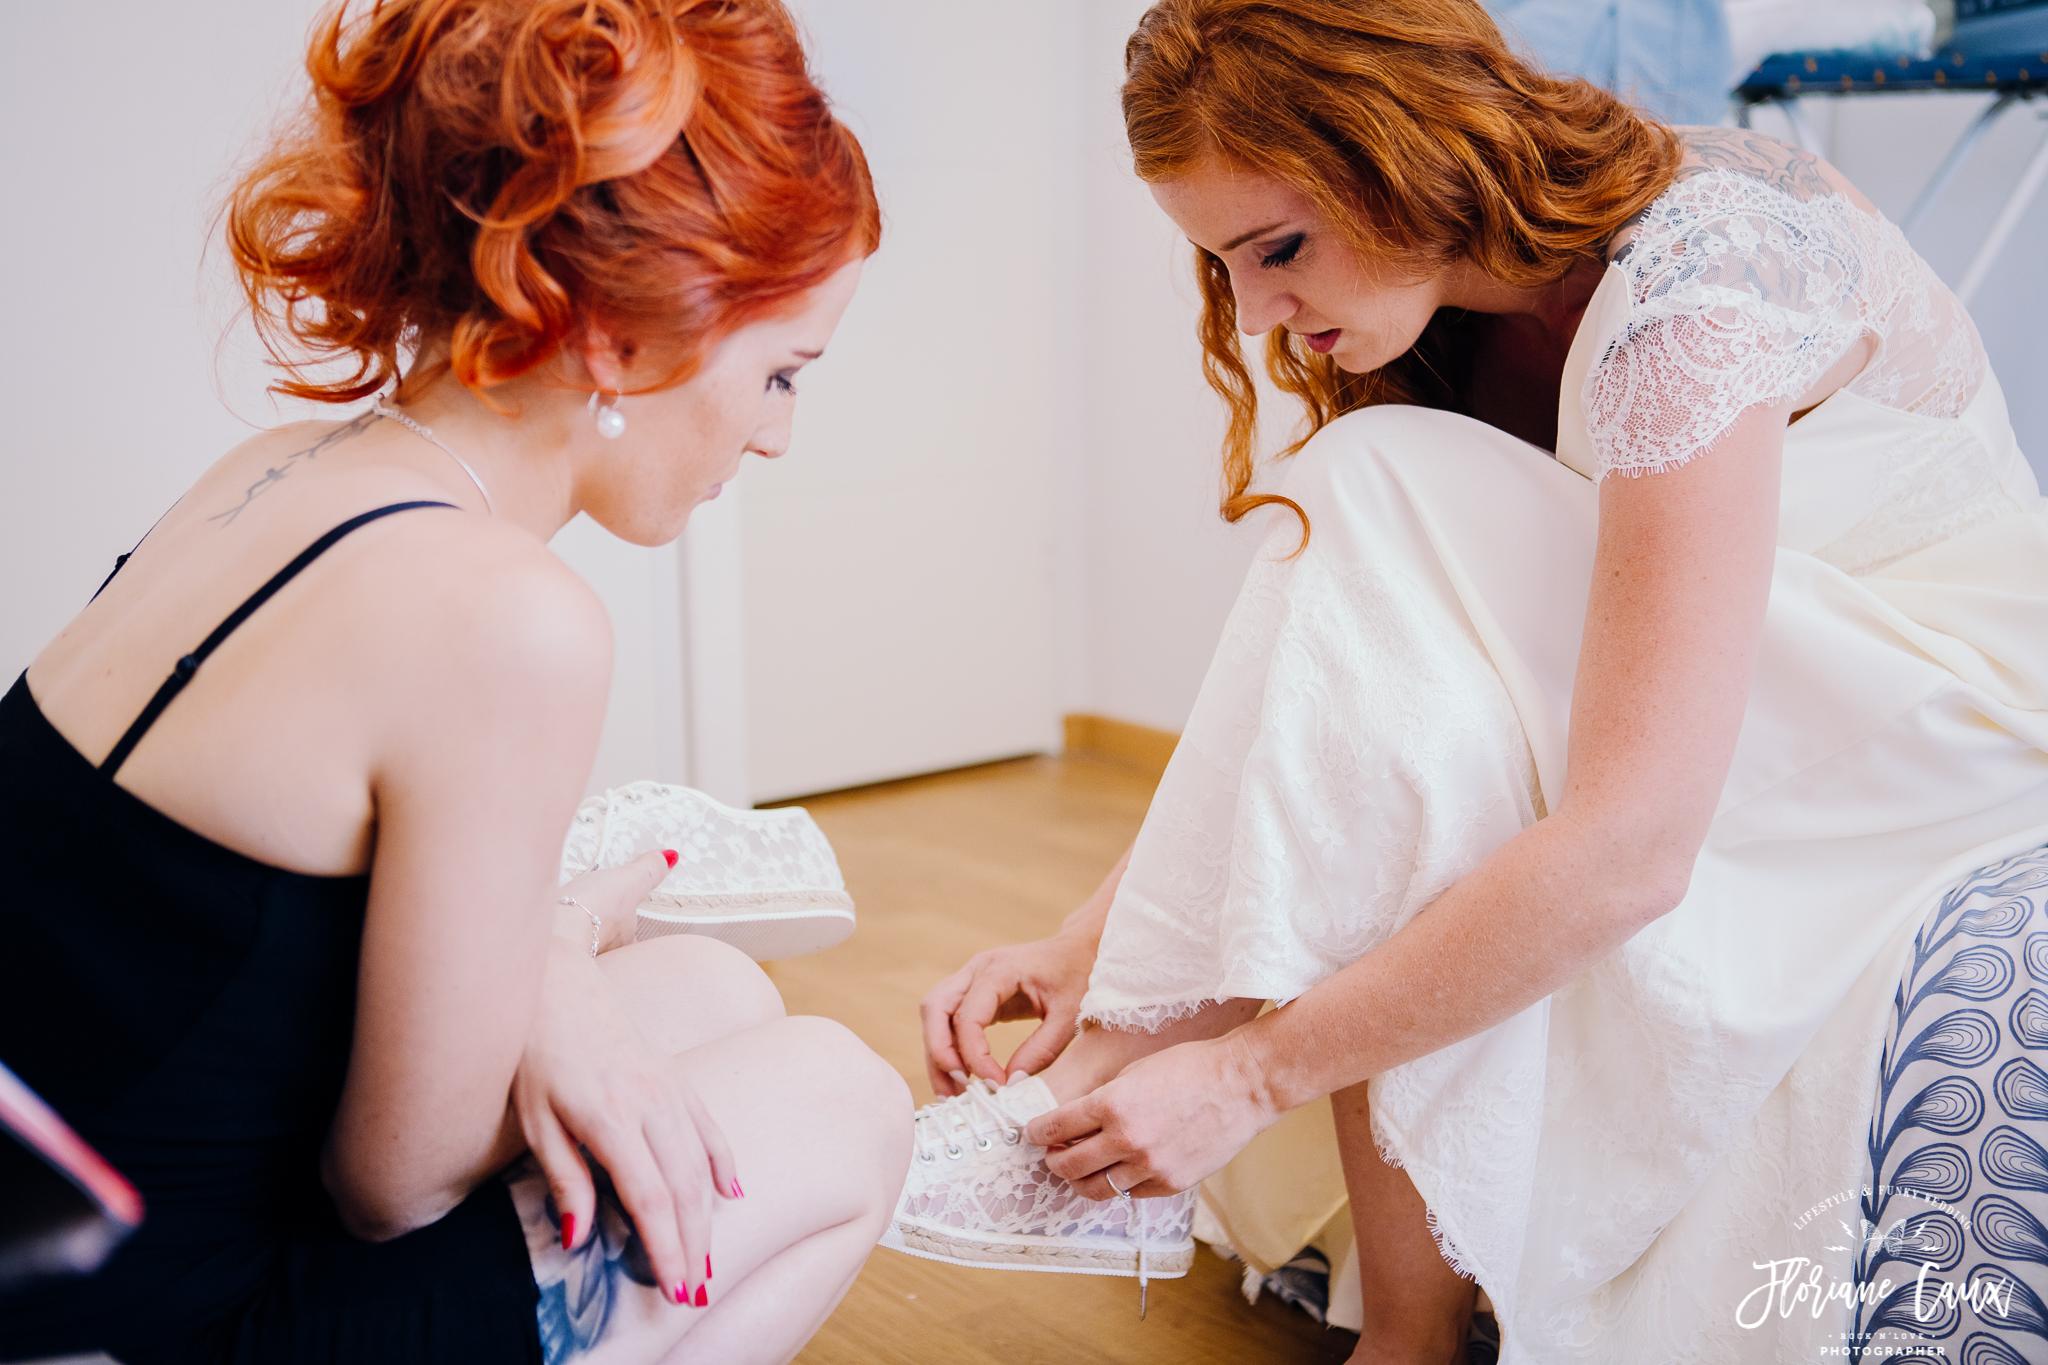 photographe-mariage-toulouse-rocknroll-maries-tatoues-floriane-caux-12